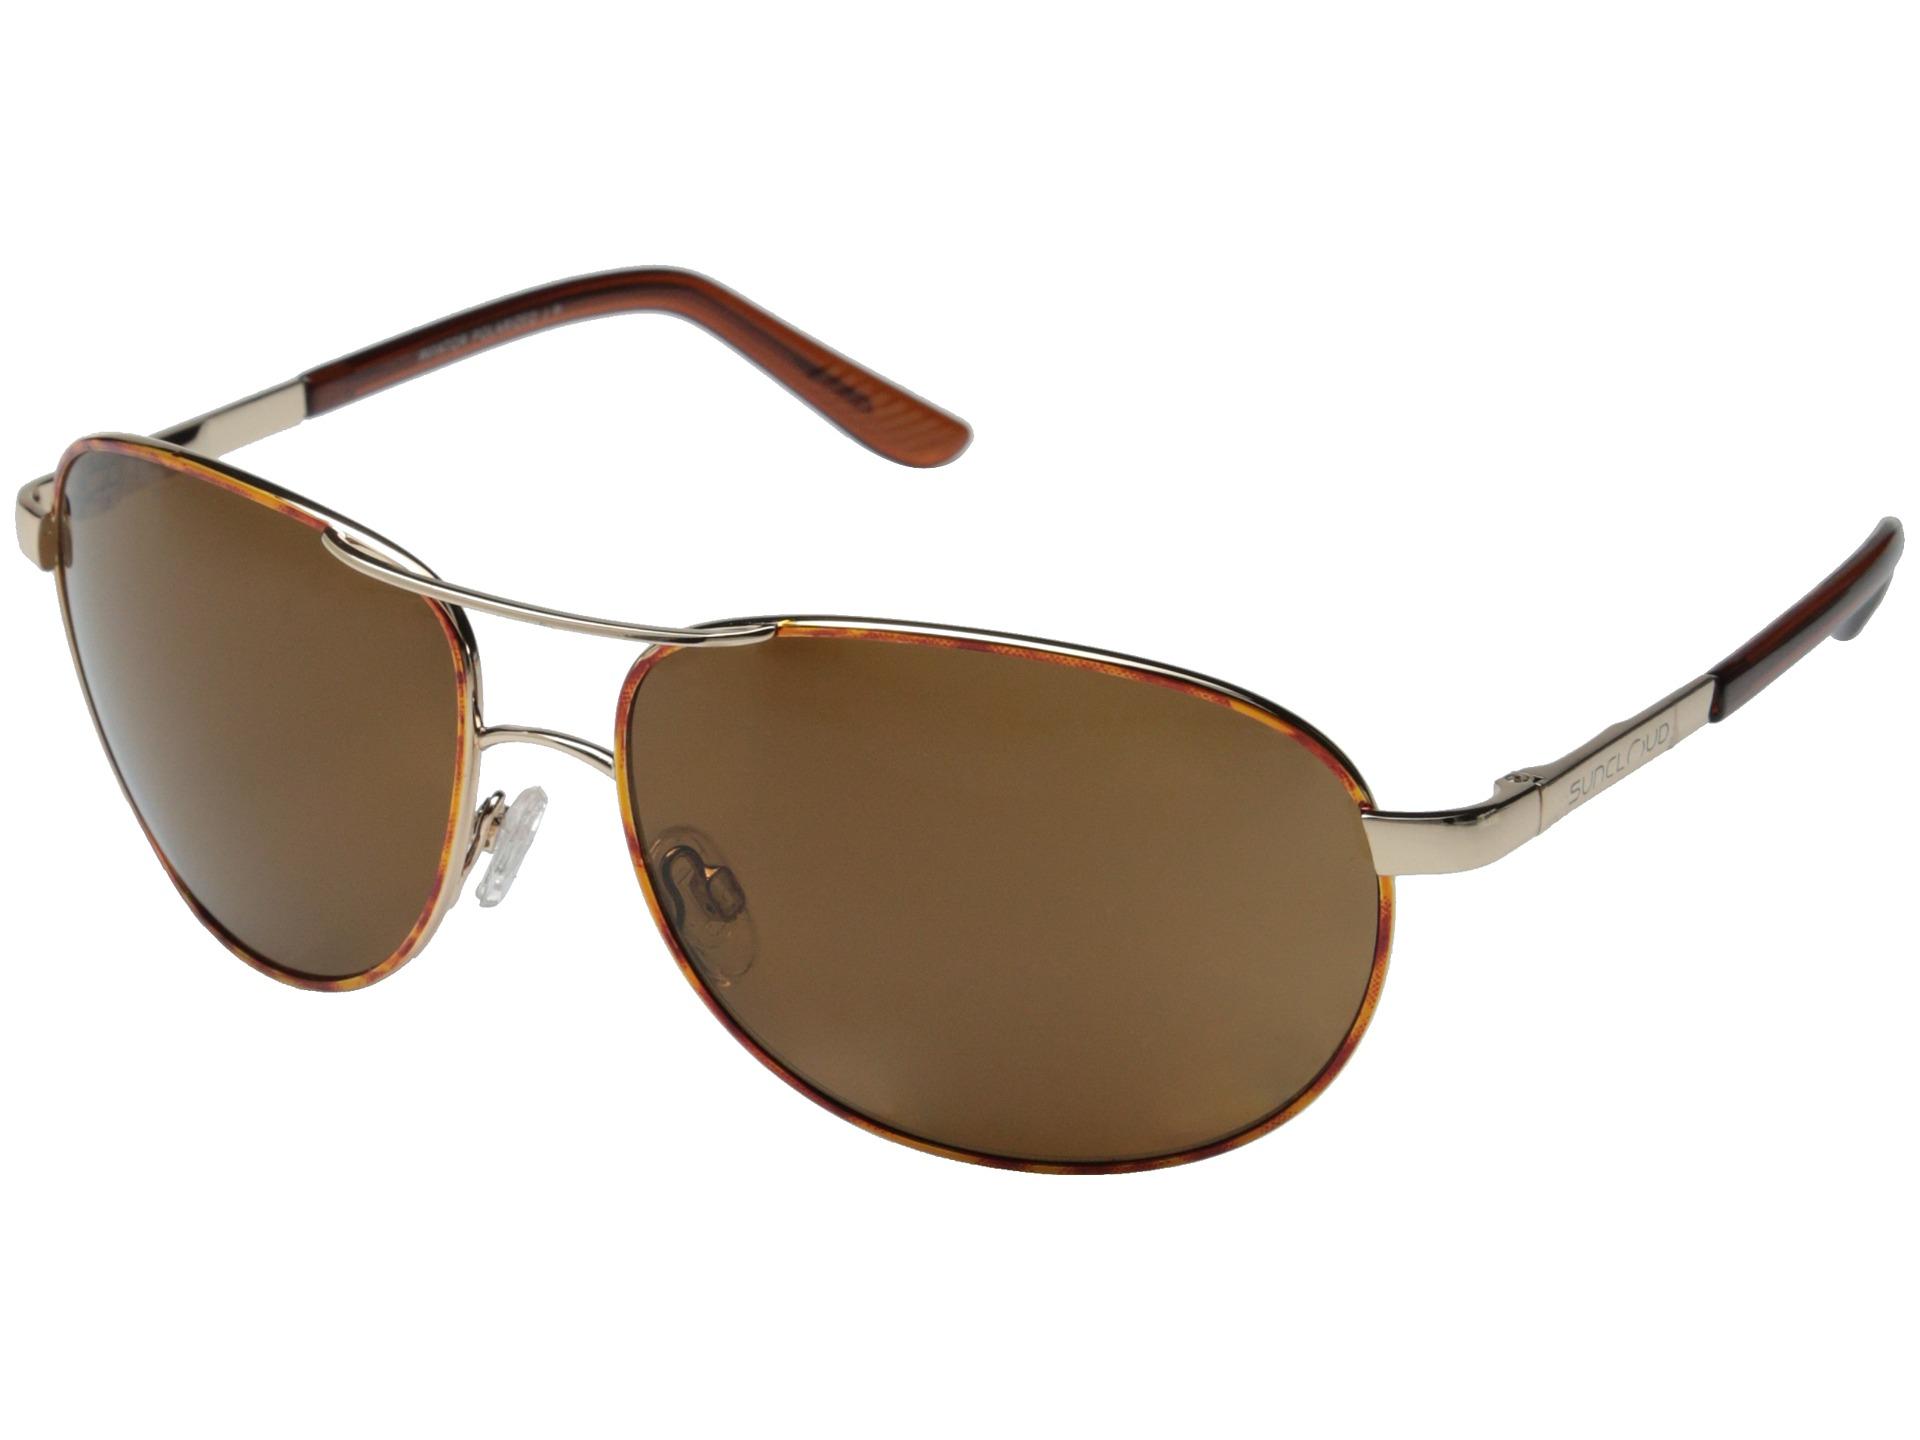 e32e218e3b27 Review Nautica Women Polarized Sunglasses